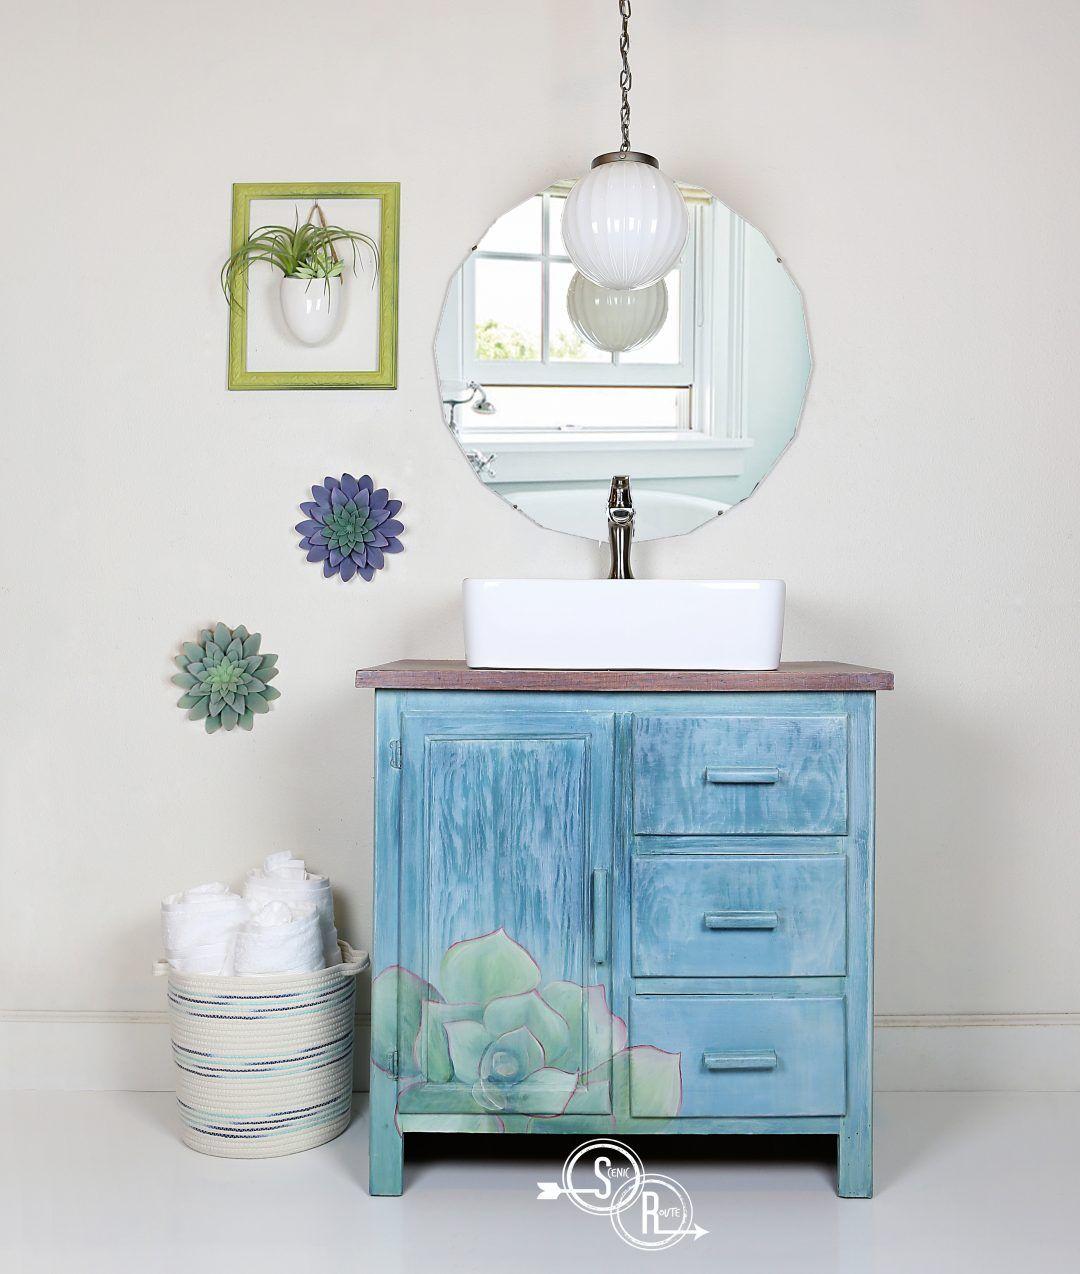 Bathroom Vanity In 2020 Home Decor Bedroom Decor Home Decor